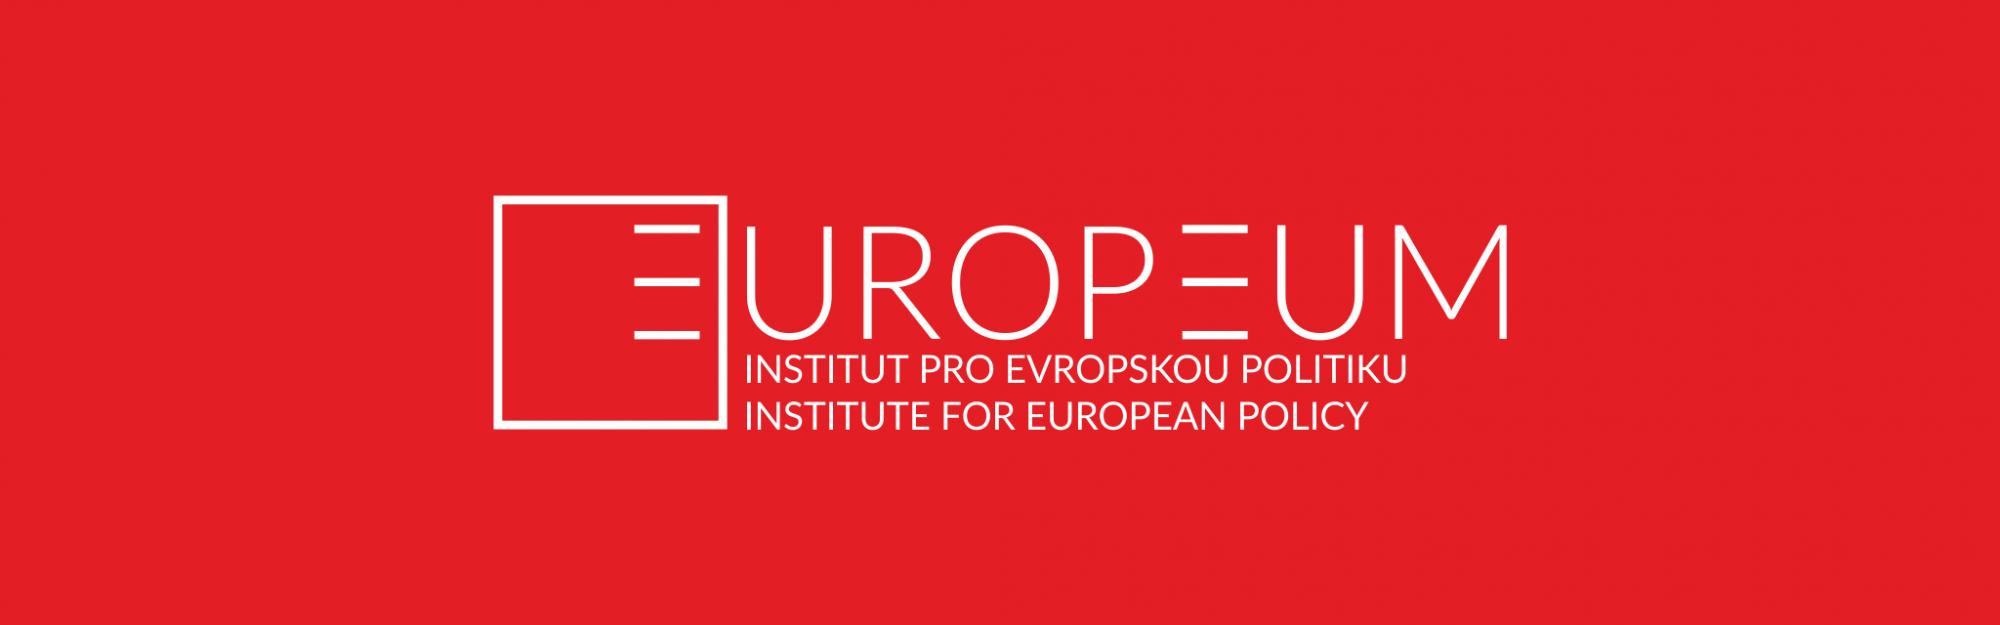 www.europeum.org